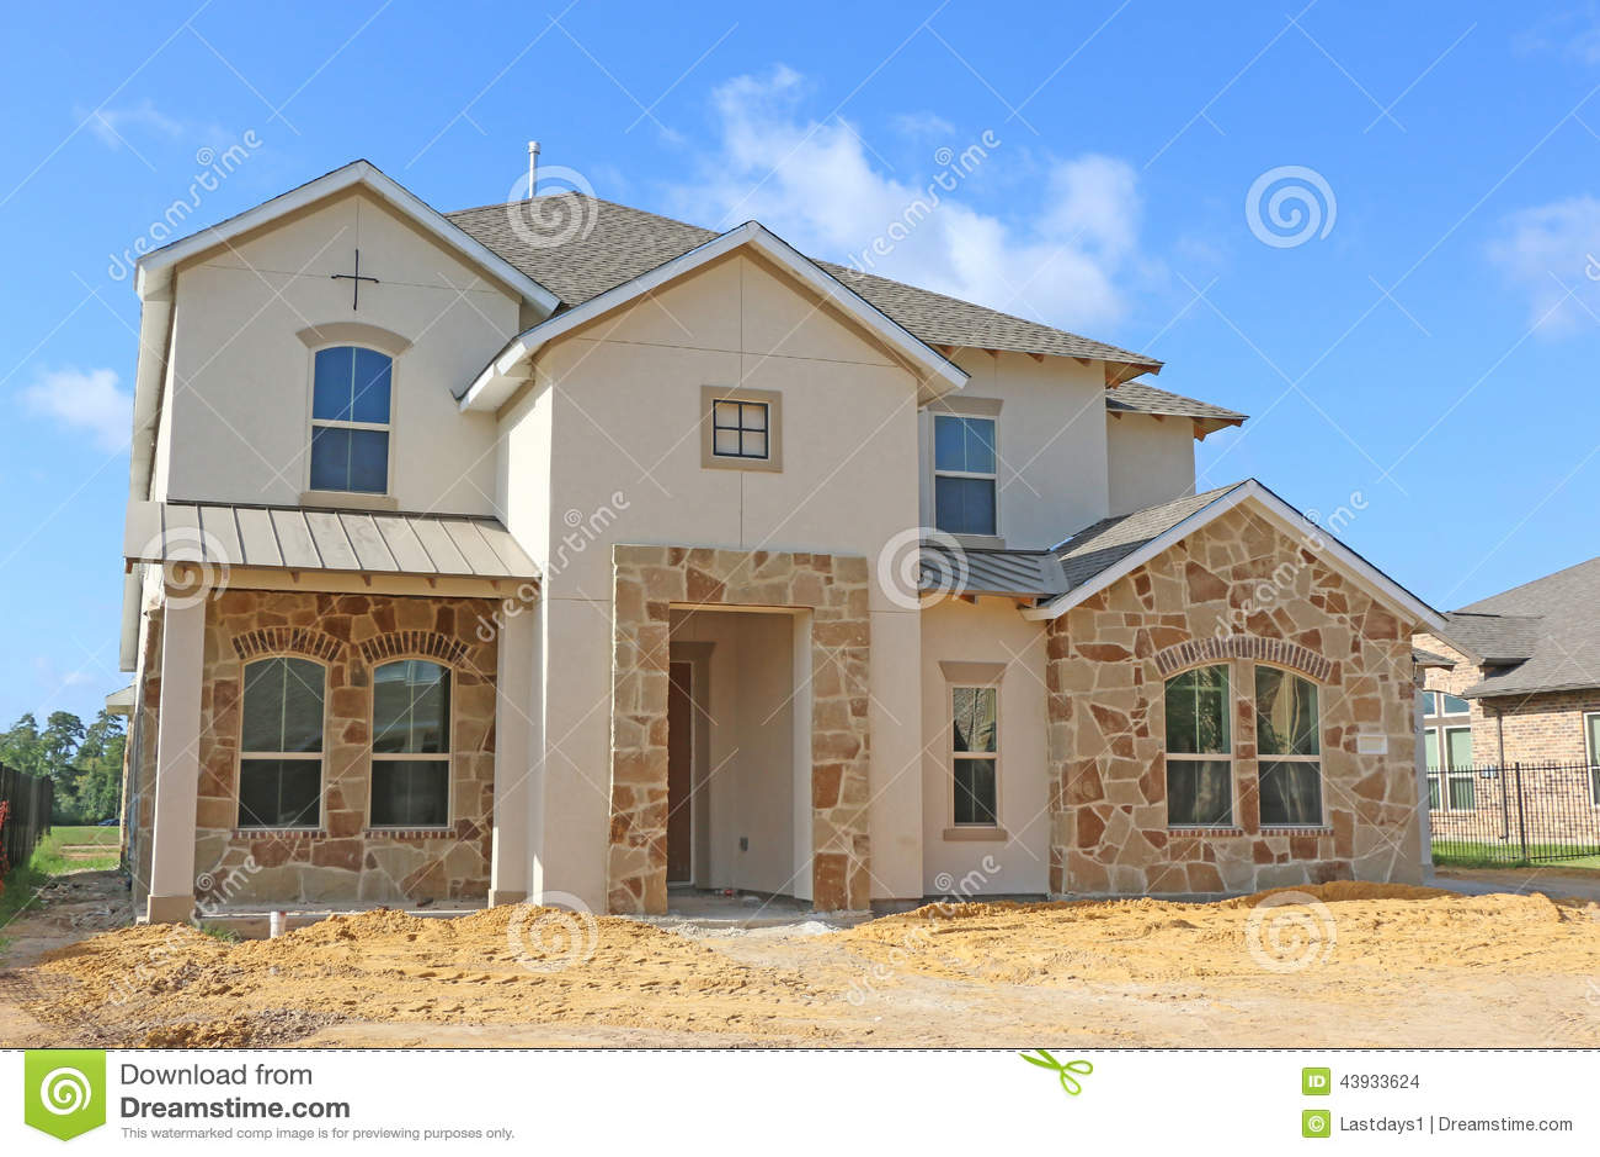 Schöne Häuser Stockfoto - Bild: 43933624 size: 1300 x 957 post ID: 3 File size: 0 B